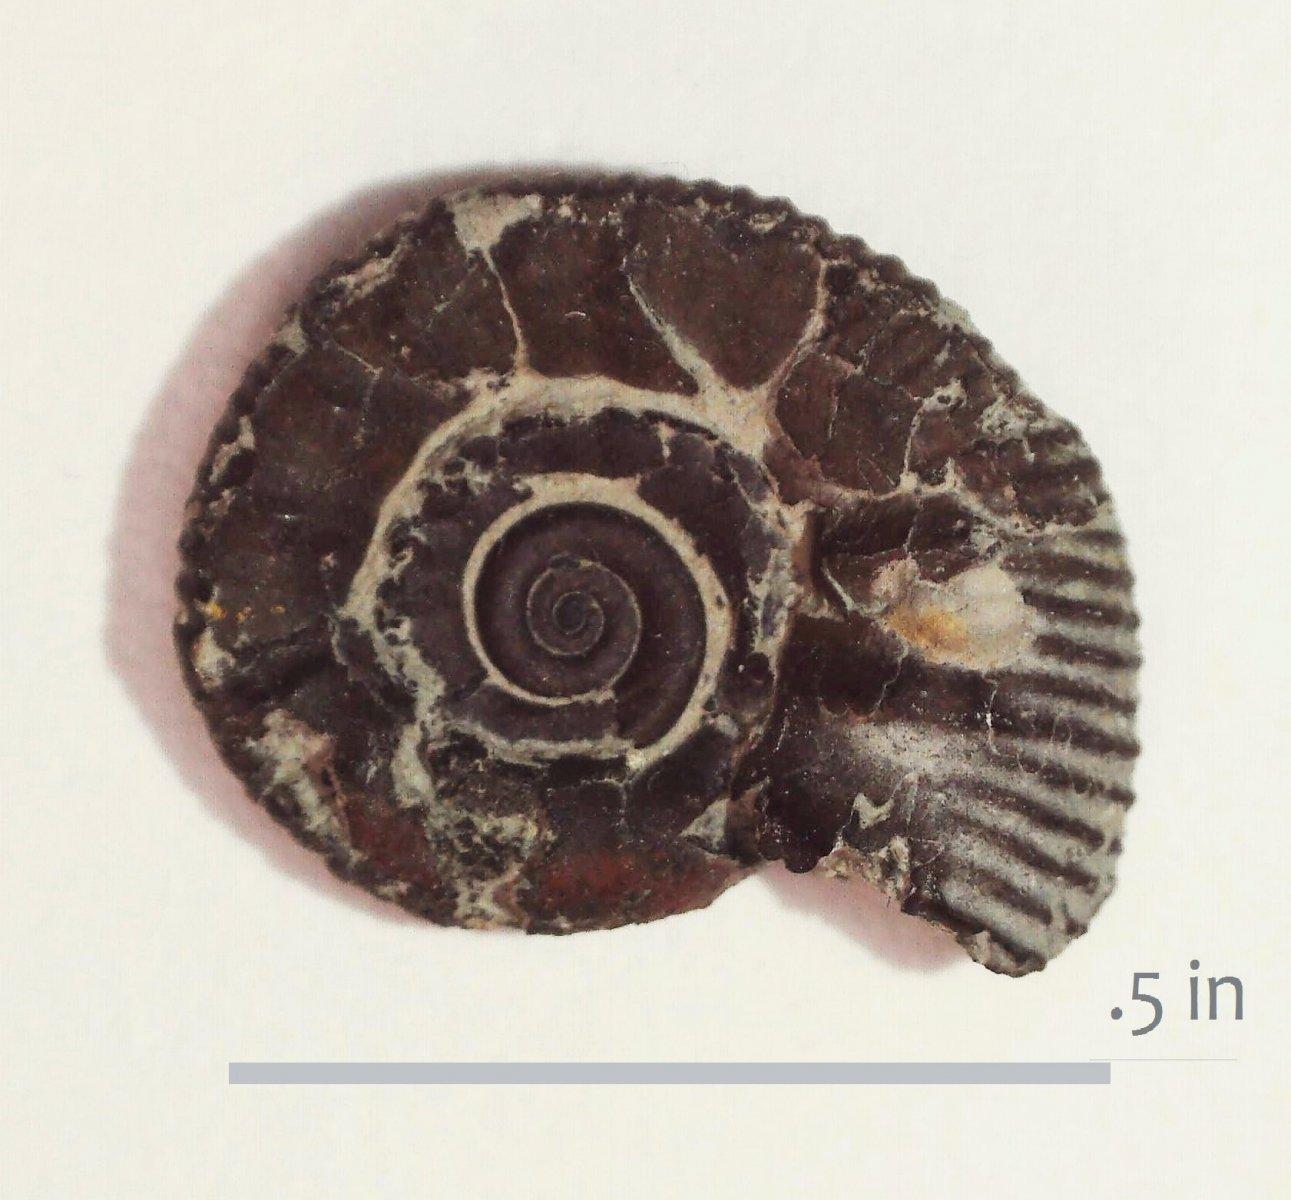 Ammonite Otoscaphites subevolutus Waco Del RIo